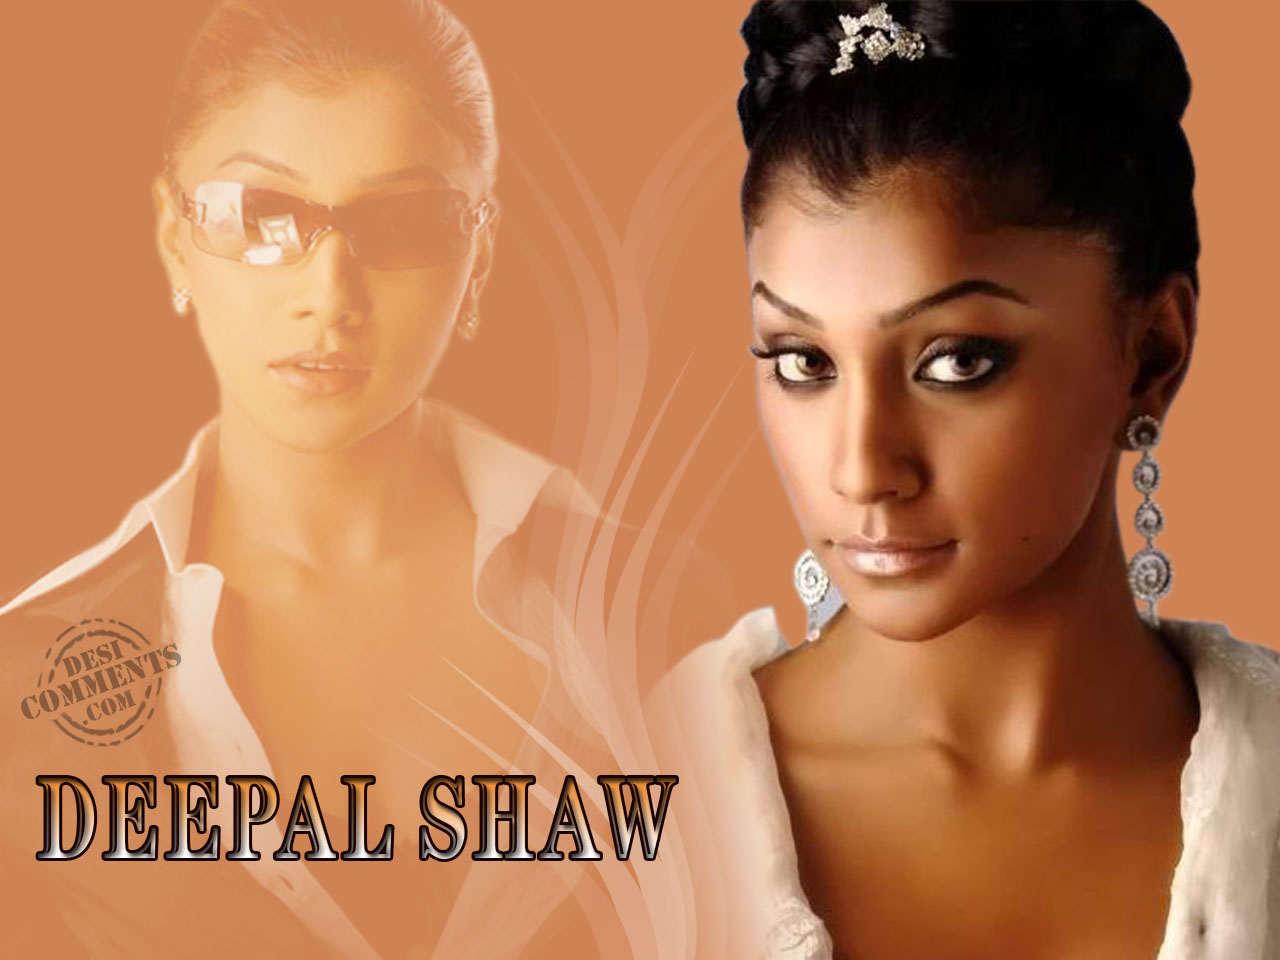 CelebsView: Deepal Shaw : Indian Actress